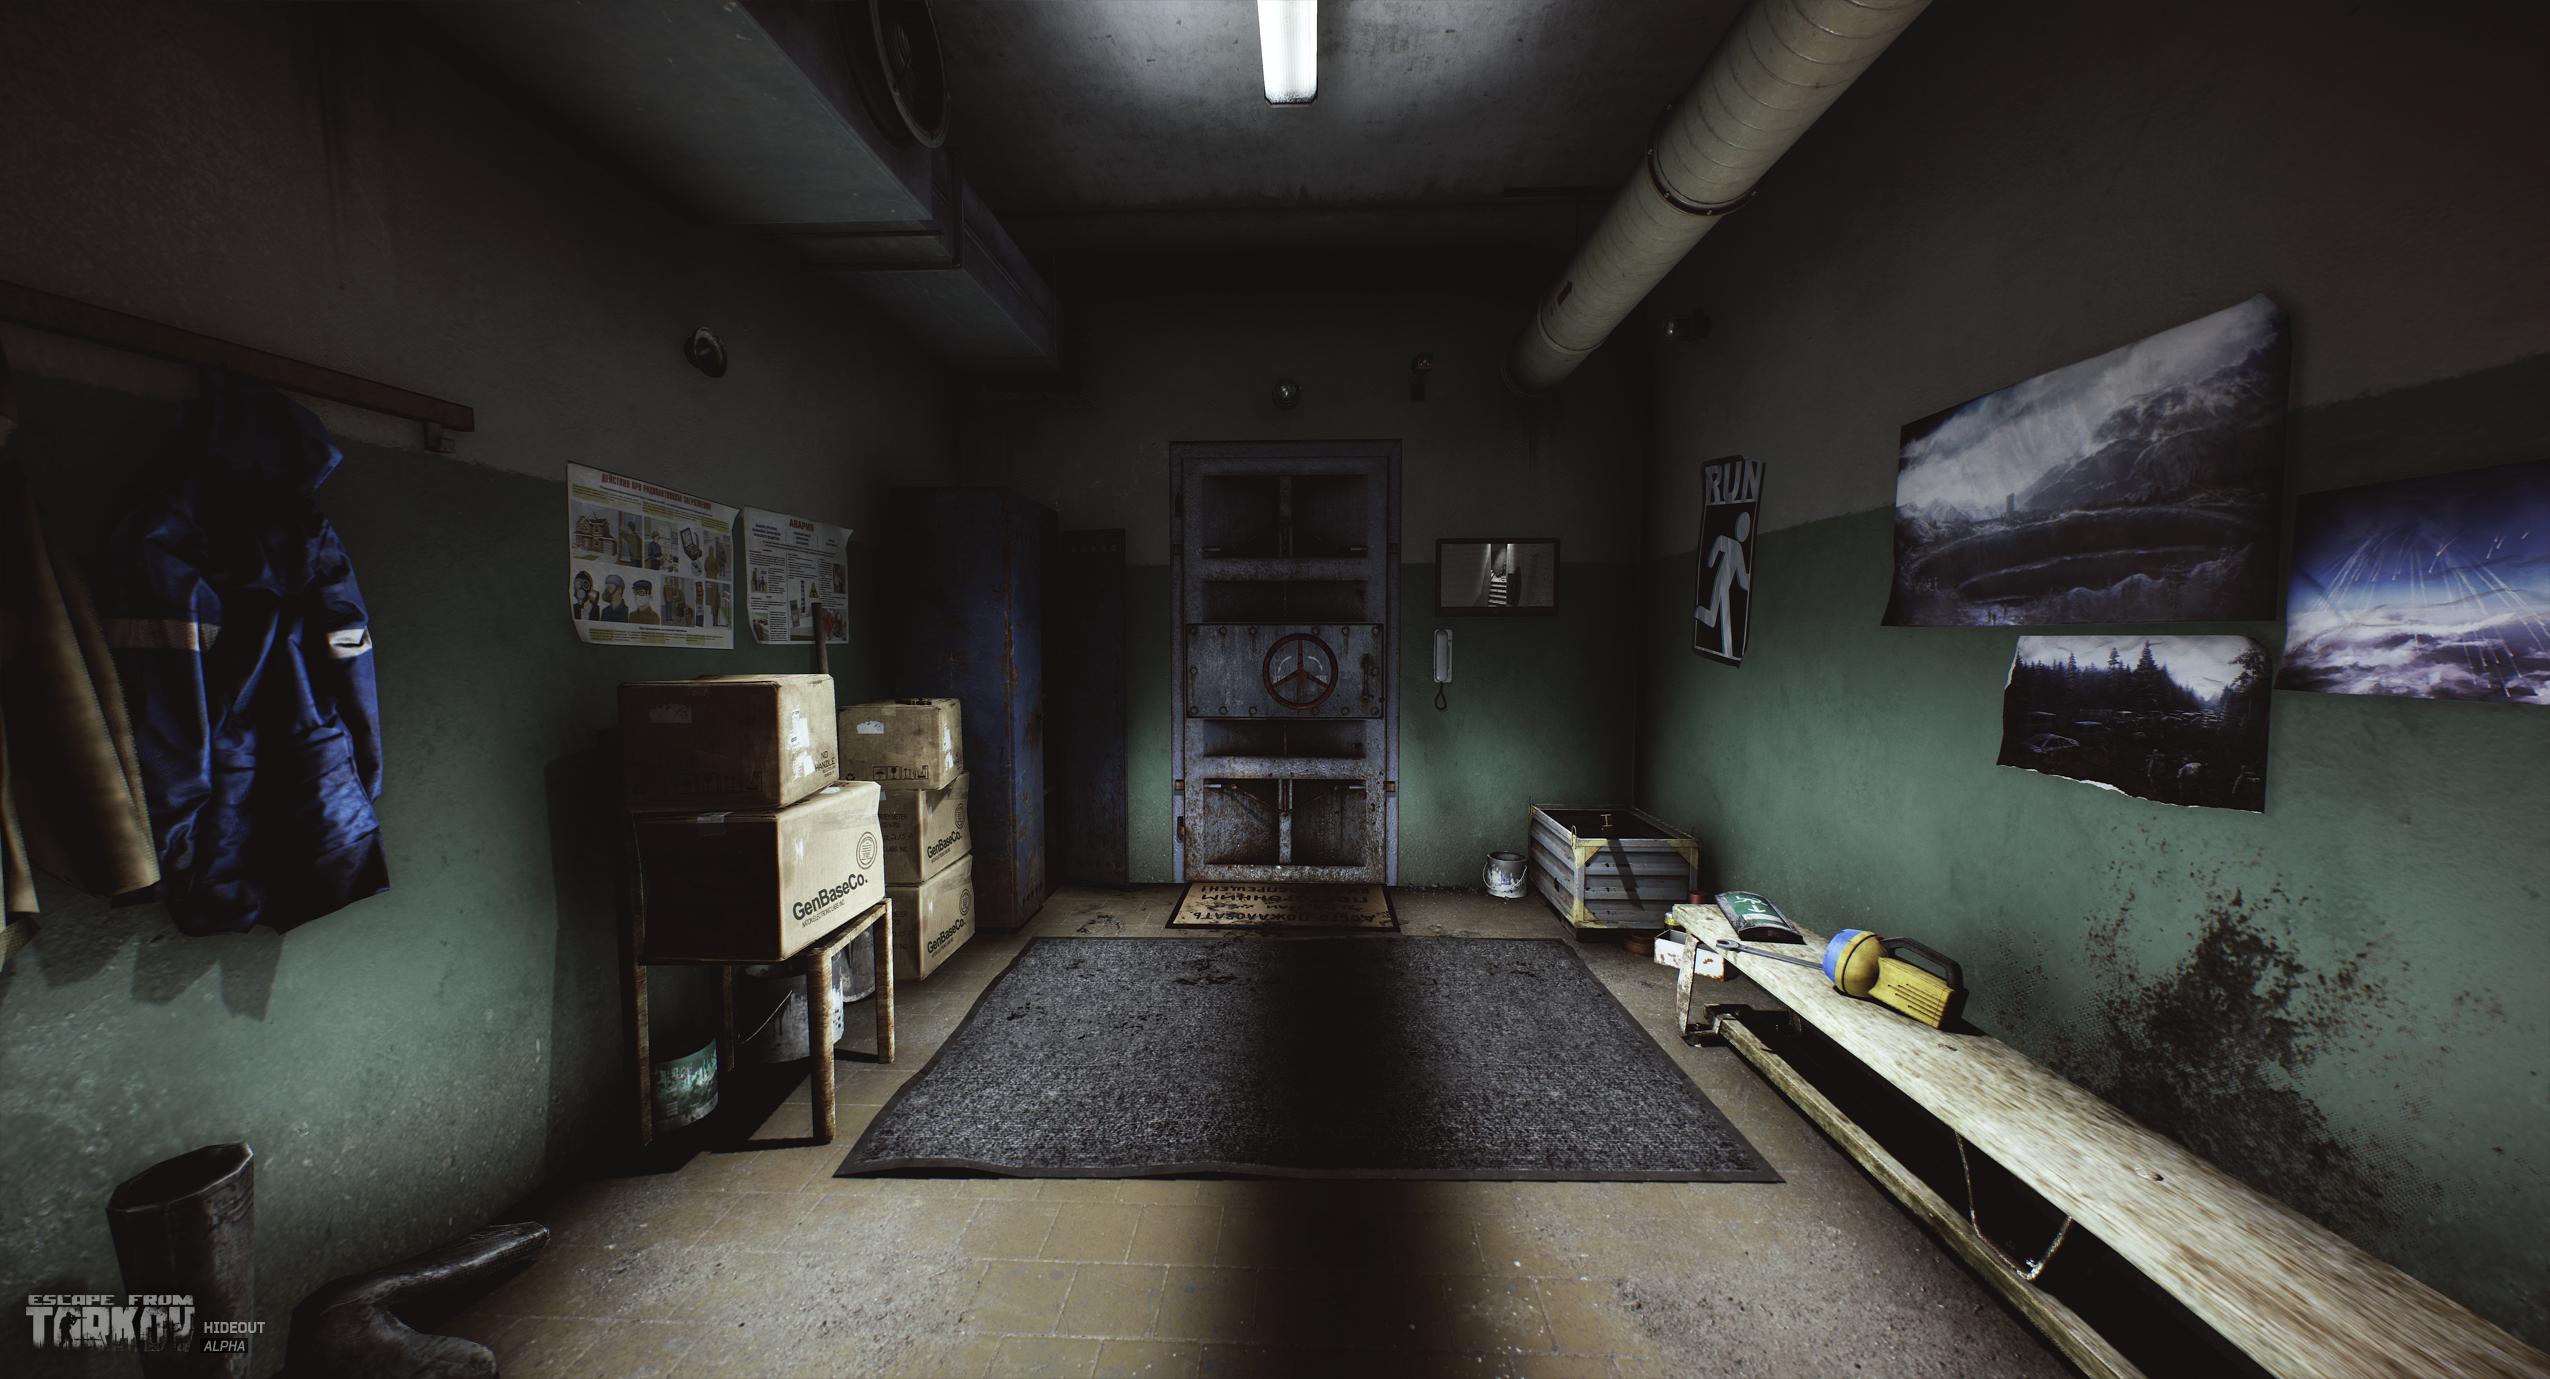 Prep for the apocalypse with Escape From Tarkov's hideouts